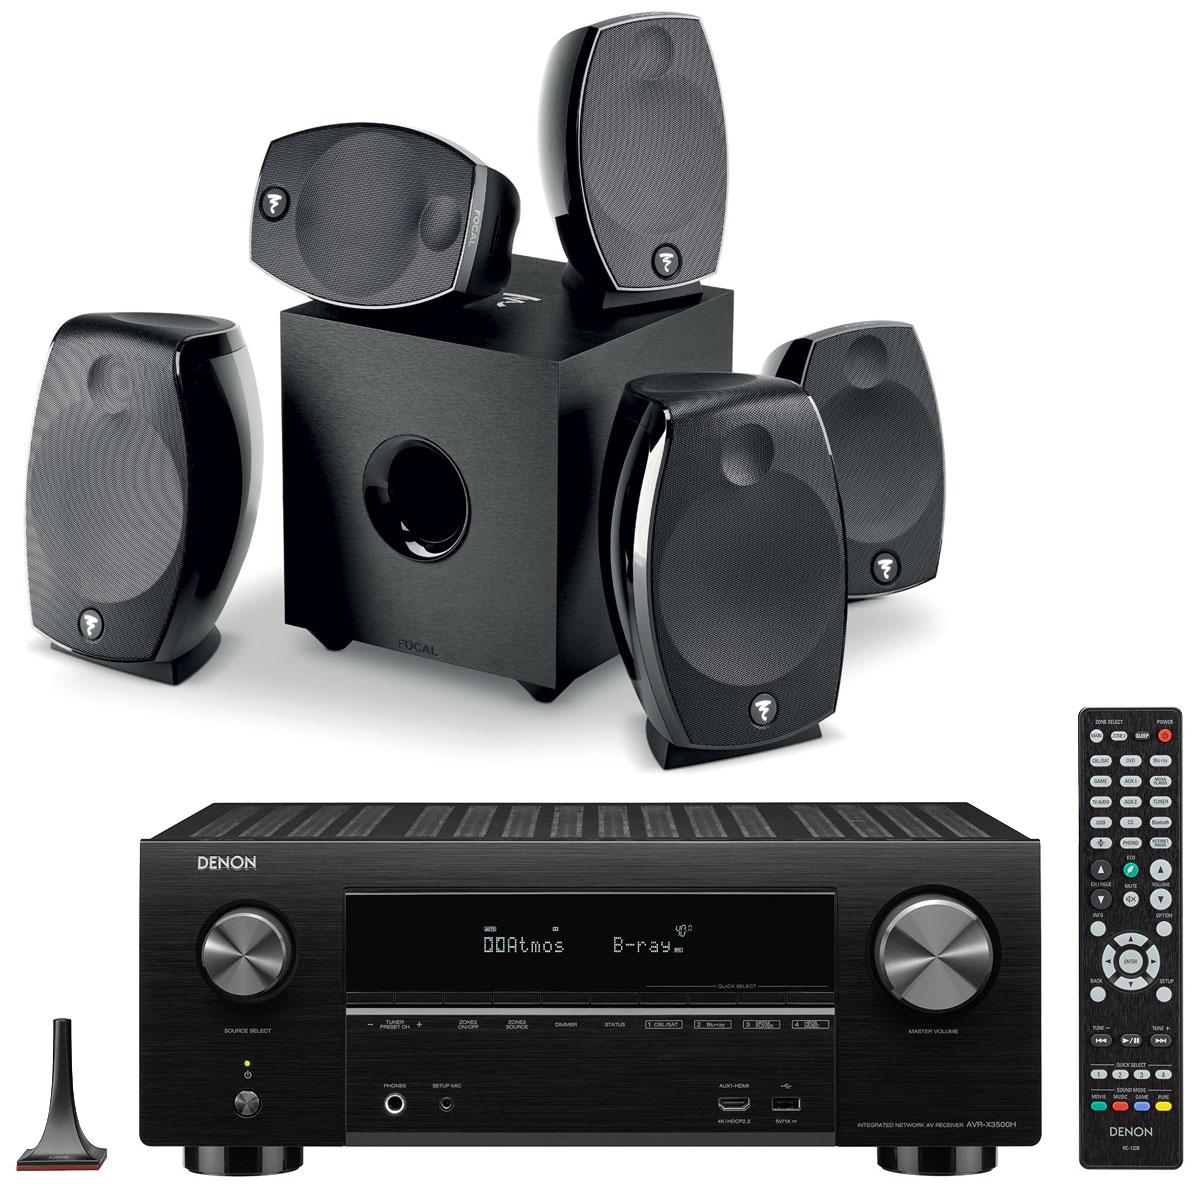 Ensemble home cinéma Denon AVR-X3500H Noir + Focal Sib Evo 5.1.2 Dolby Atmos Ampli-tuner Home Cinema 3D Ready 7.2 - Dolby Atmos / DTS:X - 8x HDMI 4K Ultra HD, HDCP 2.2, HDR - Wi-Fi, Bluetooth, AirPlay 2 - Multiroom - Amazon Alexa + Pack d'enceintes 5.1.2